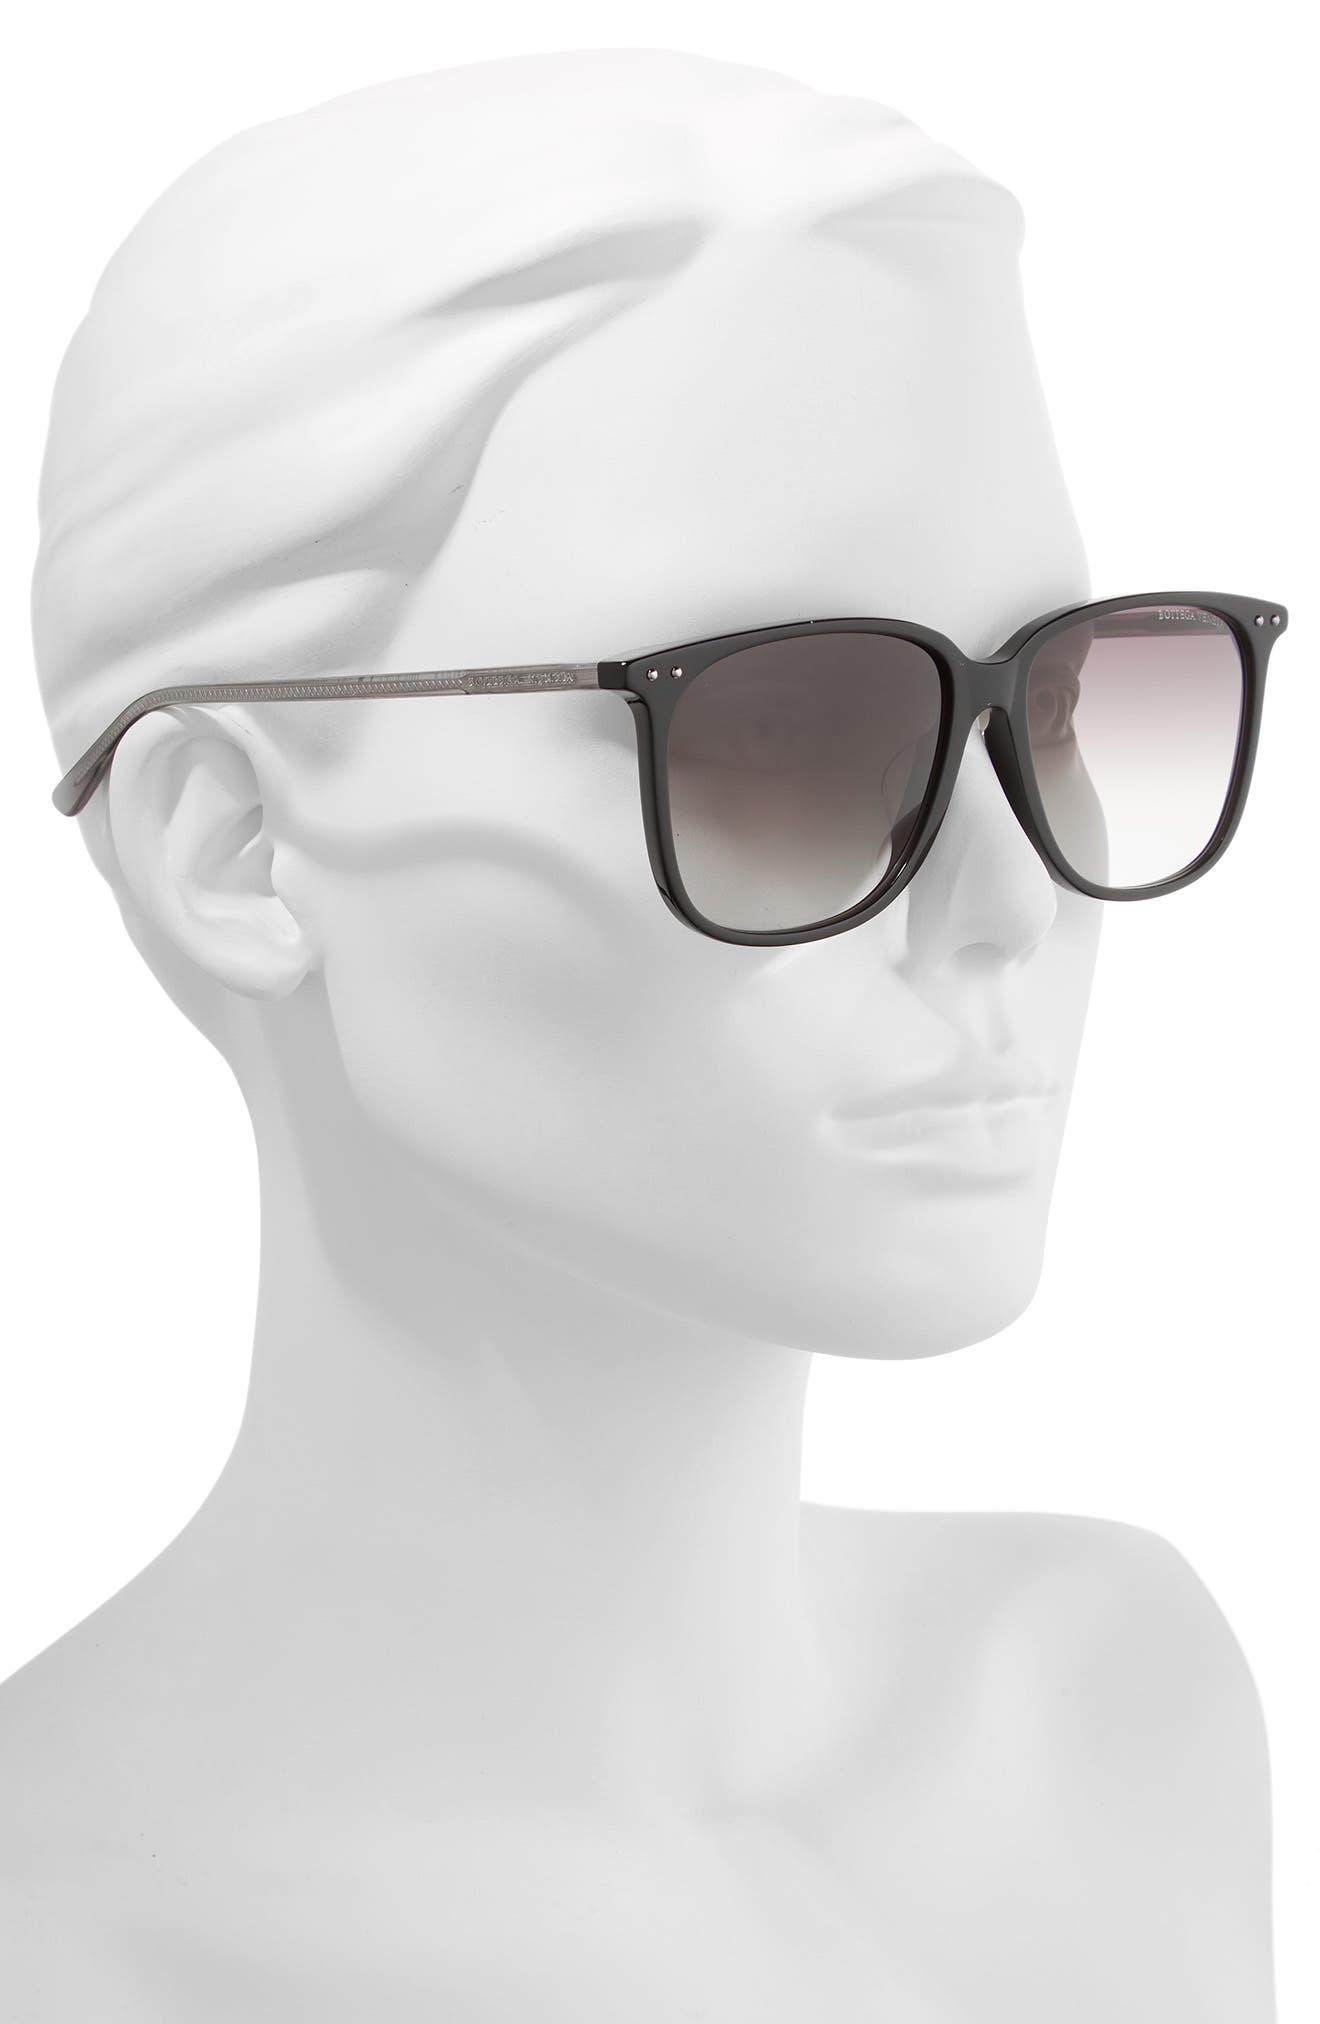 58mm Gradient Square Sunglasses,                             Alternate thumbnail 2, color,                             BLACK/ GREY